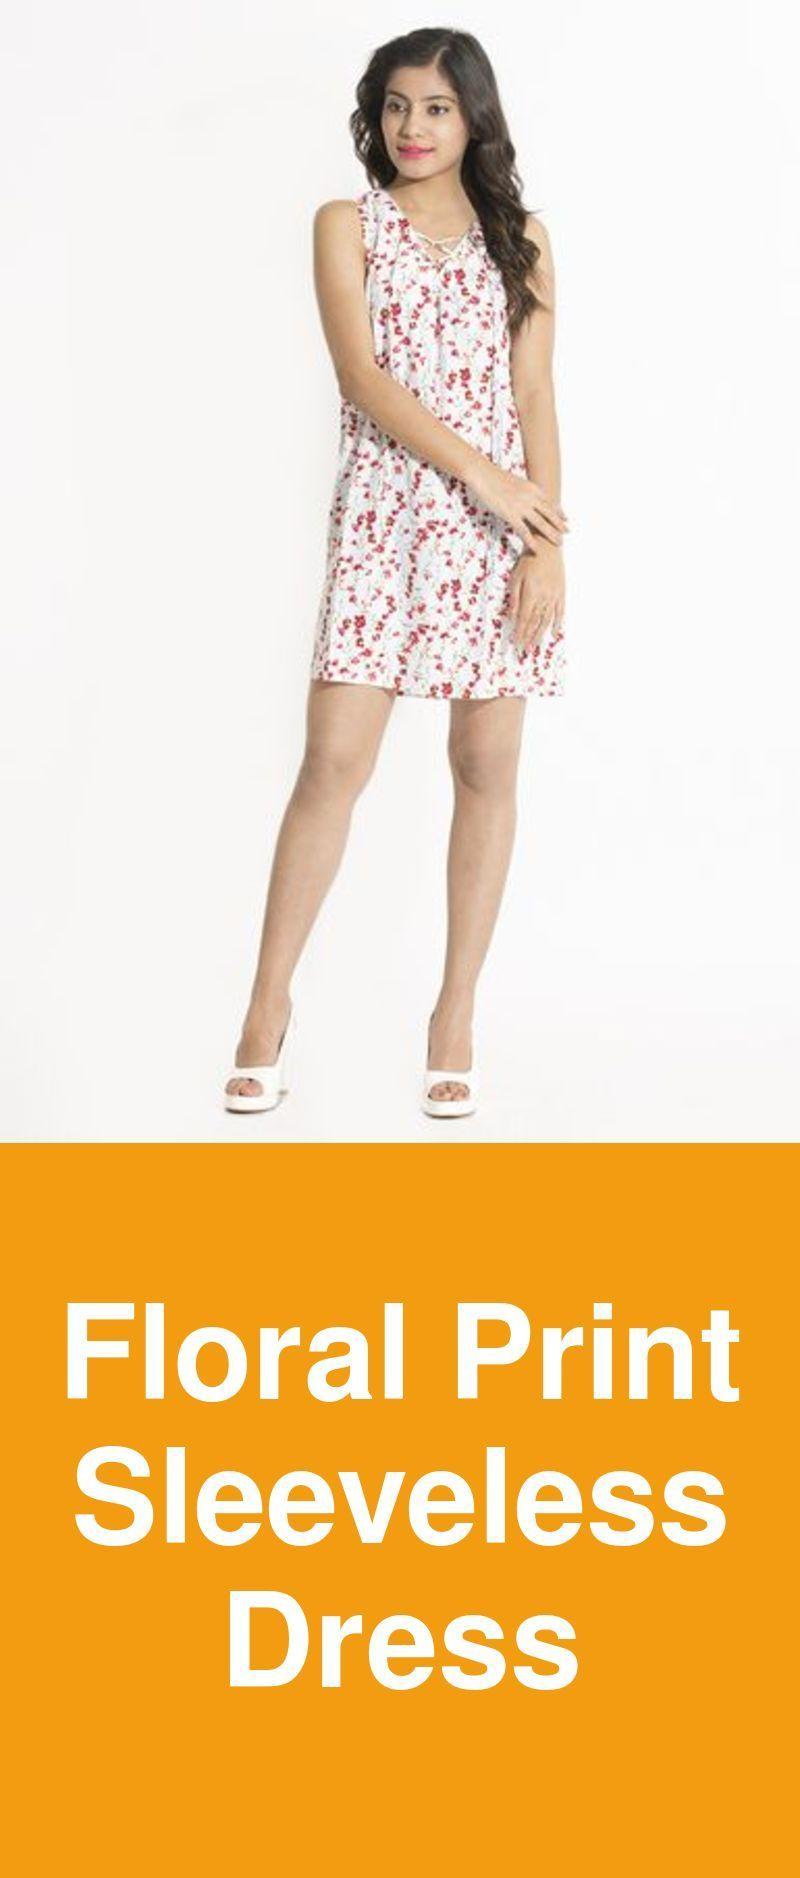 7116c46e489 floral print sleeveless dress SKU 11036186 Brand Artery Category Women  Clothing Sub category Dresses Fabric Poly